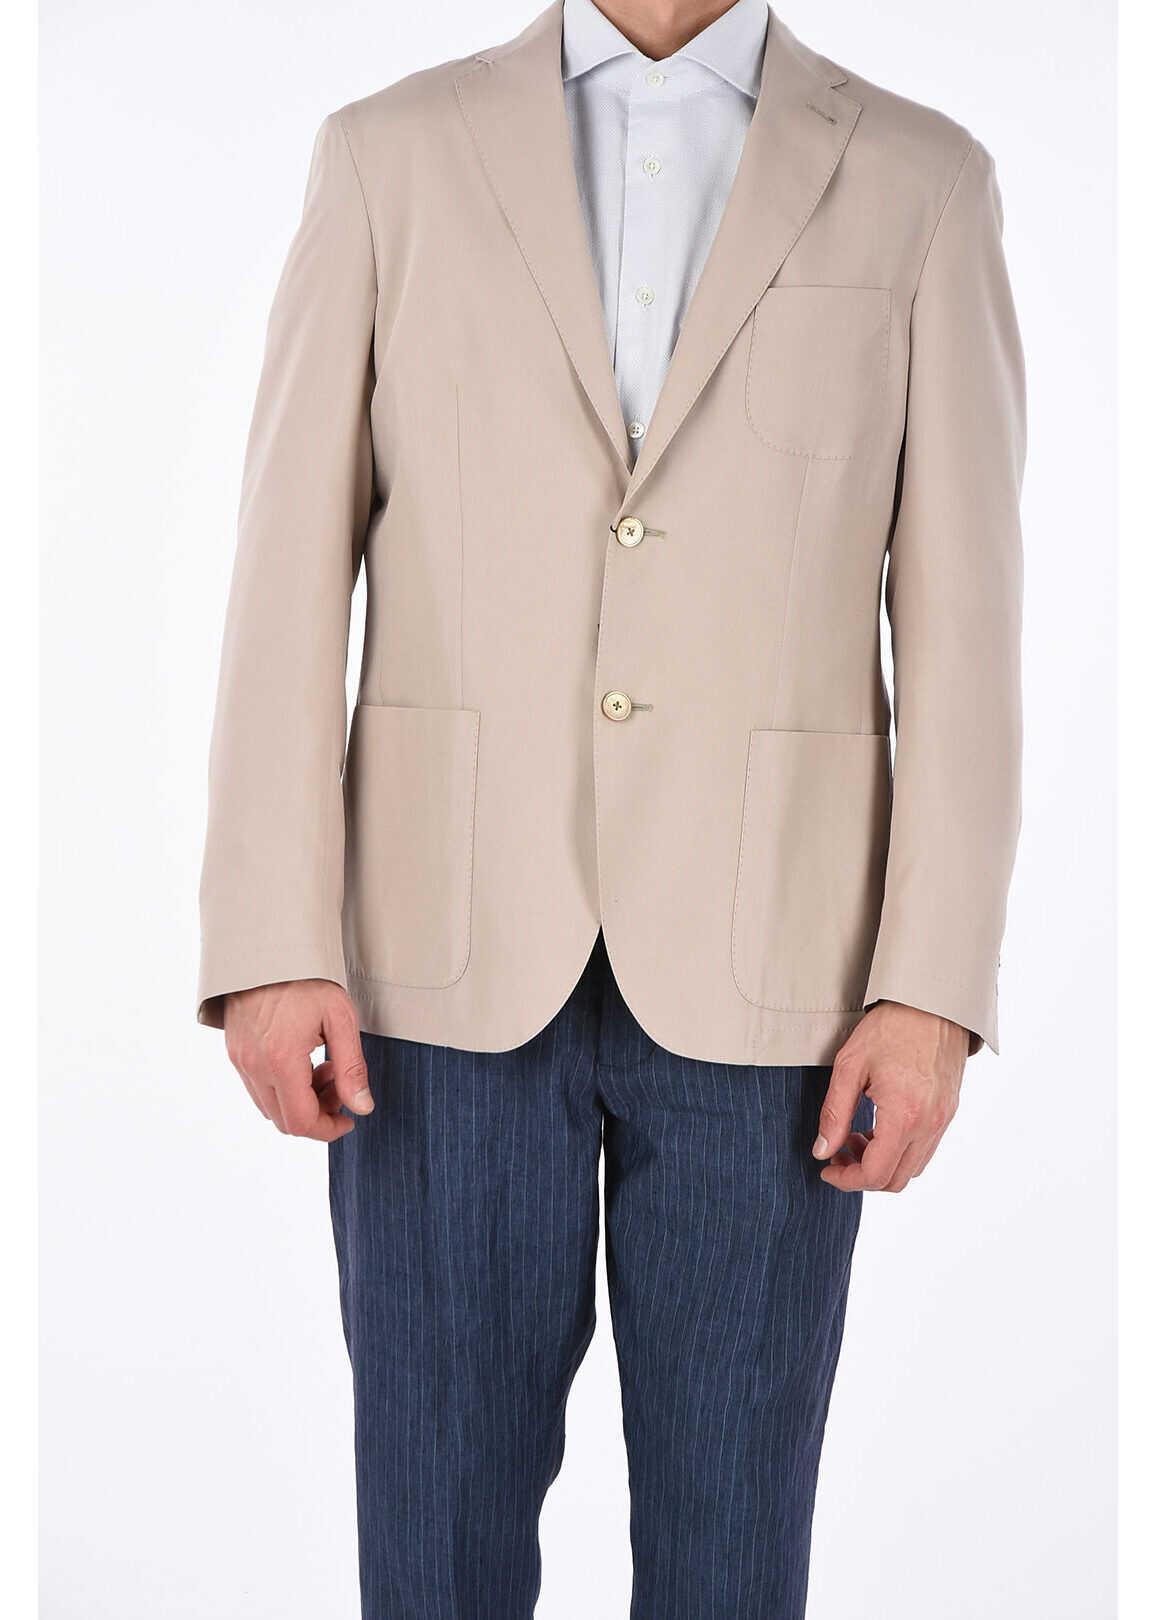 CORNELIANI ID silk IDENTITY blazer BEIGE imagine